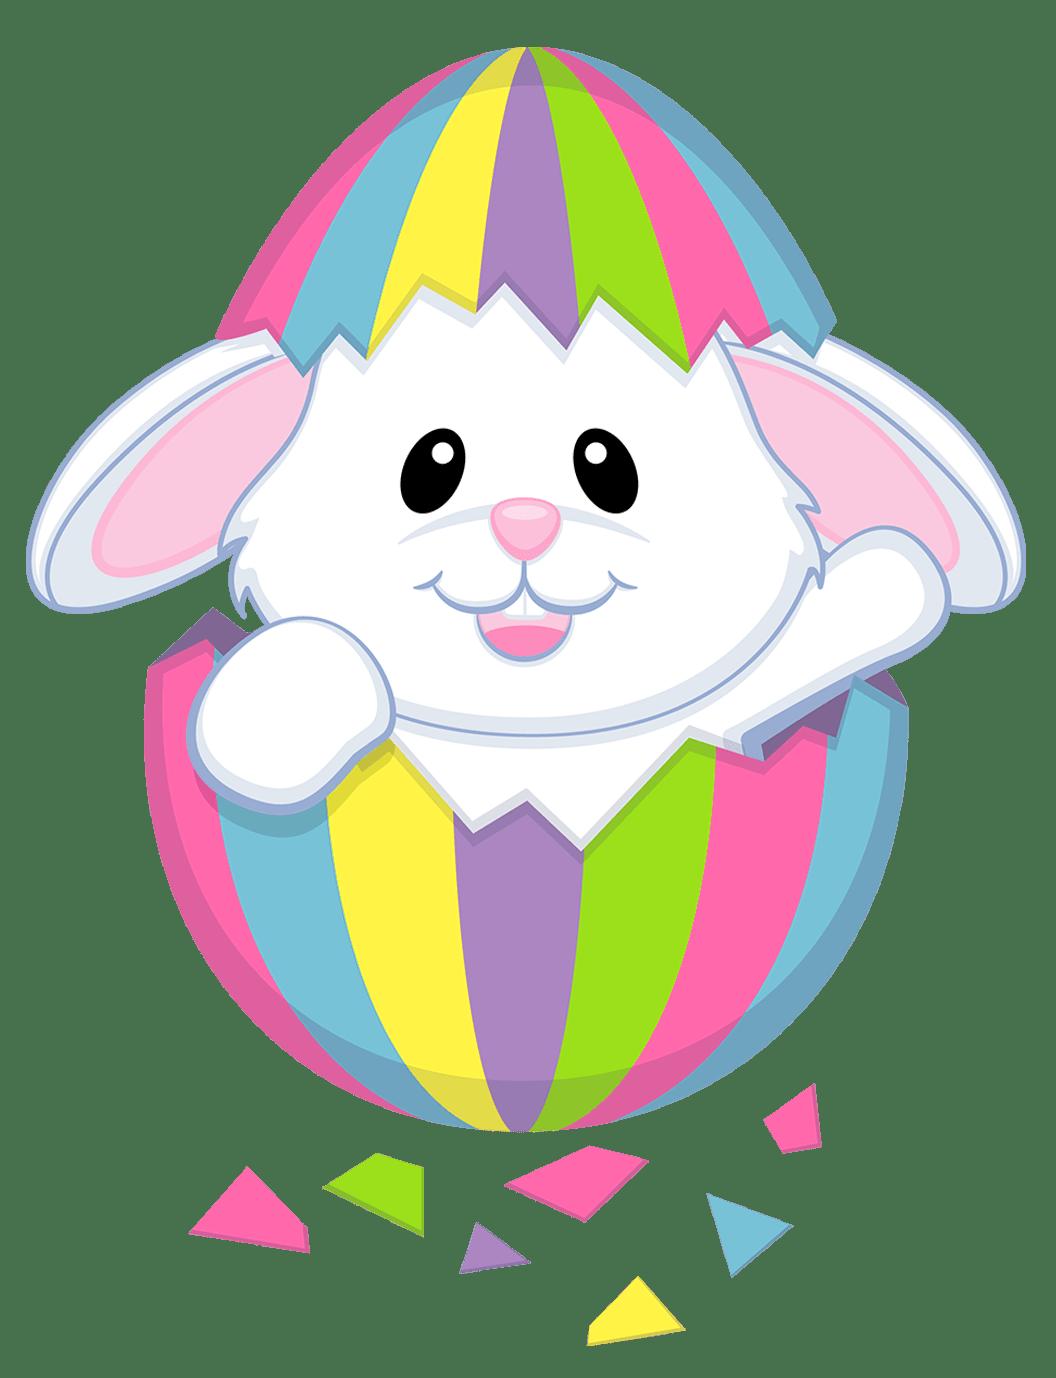 Easter cross free clipart jpg free download Top 100 Images Of Easter Eggs Free Download|Happy Easter 2018 jpg free download